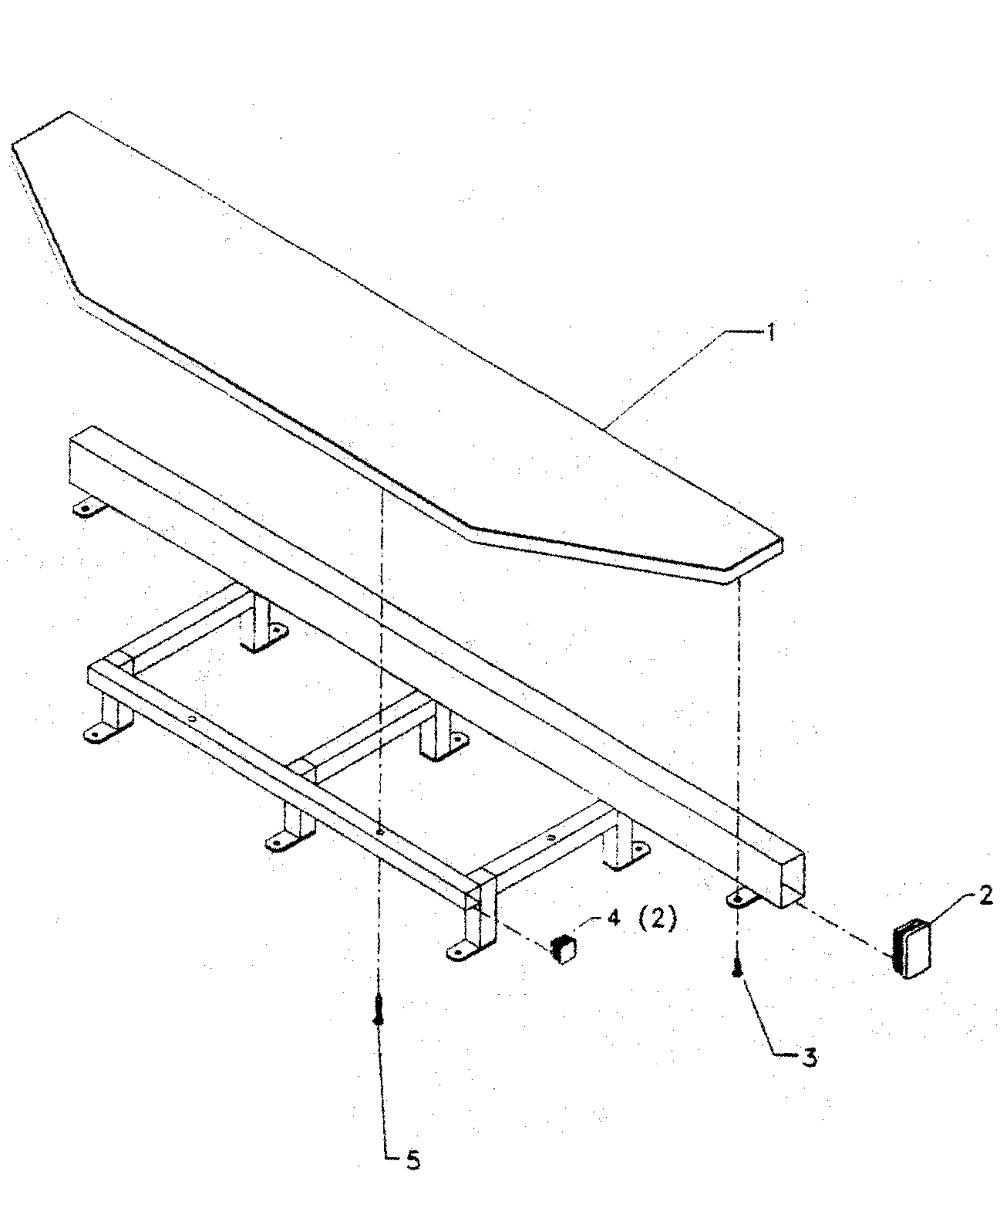 wiring diagram for miter saw band saw diagram wiring